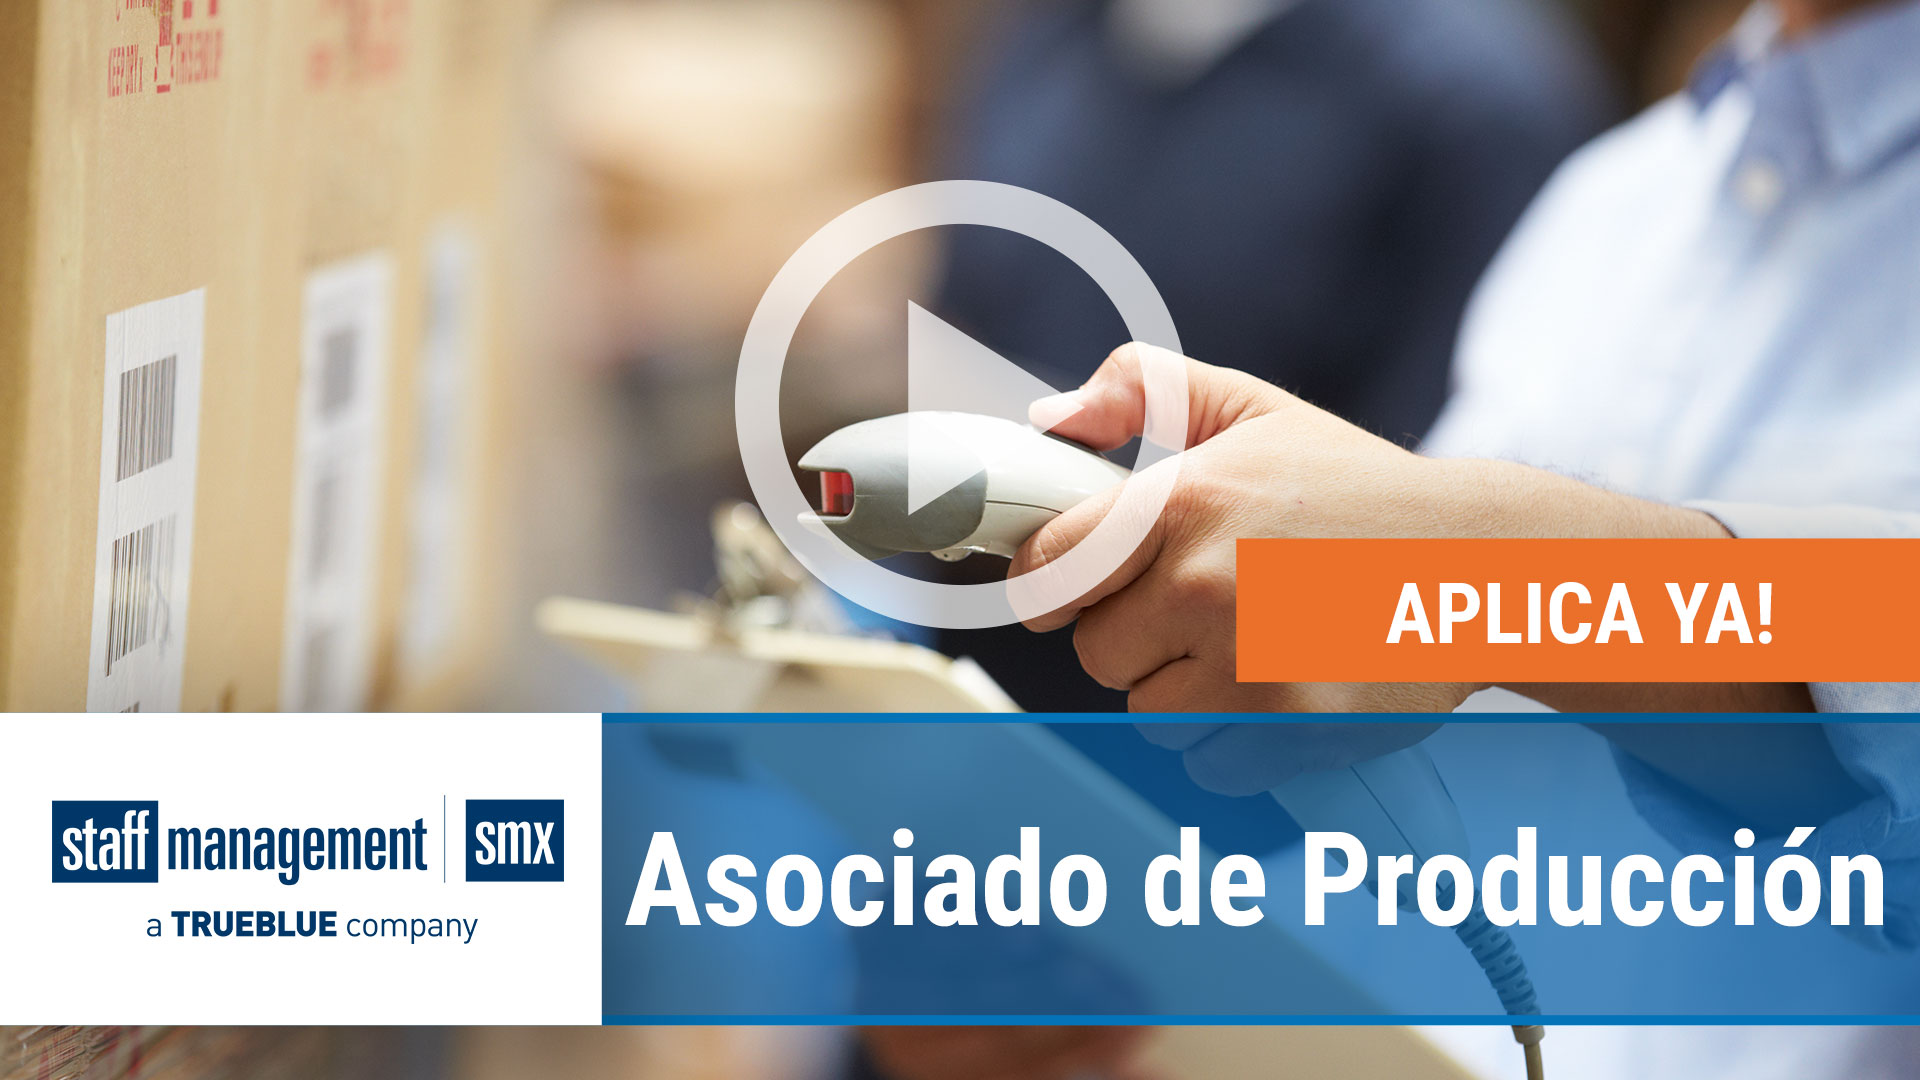 Watch our careers video for available job opening Asociado de Producción in Varies, Varies